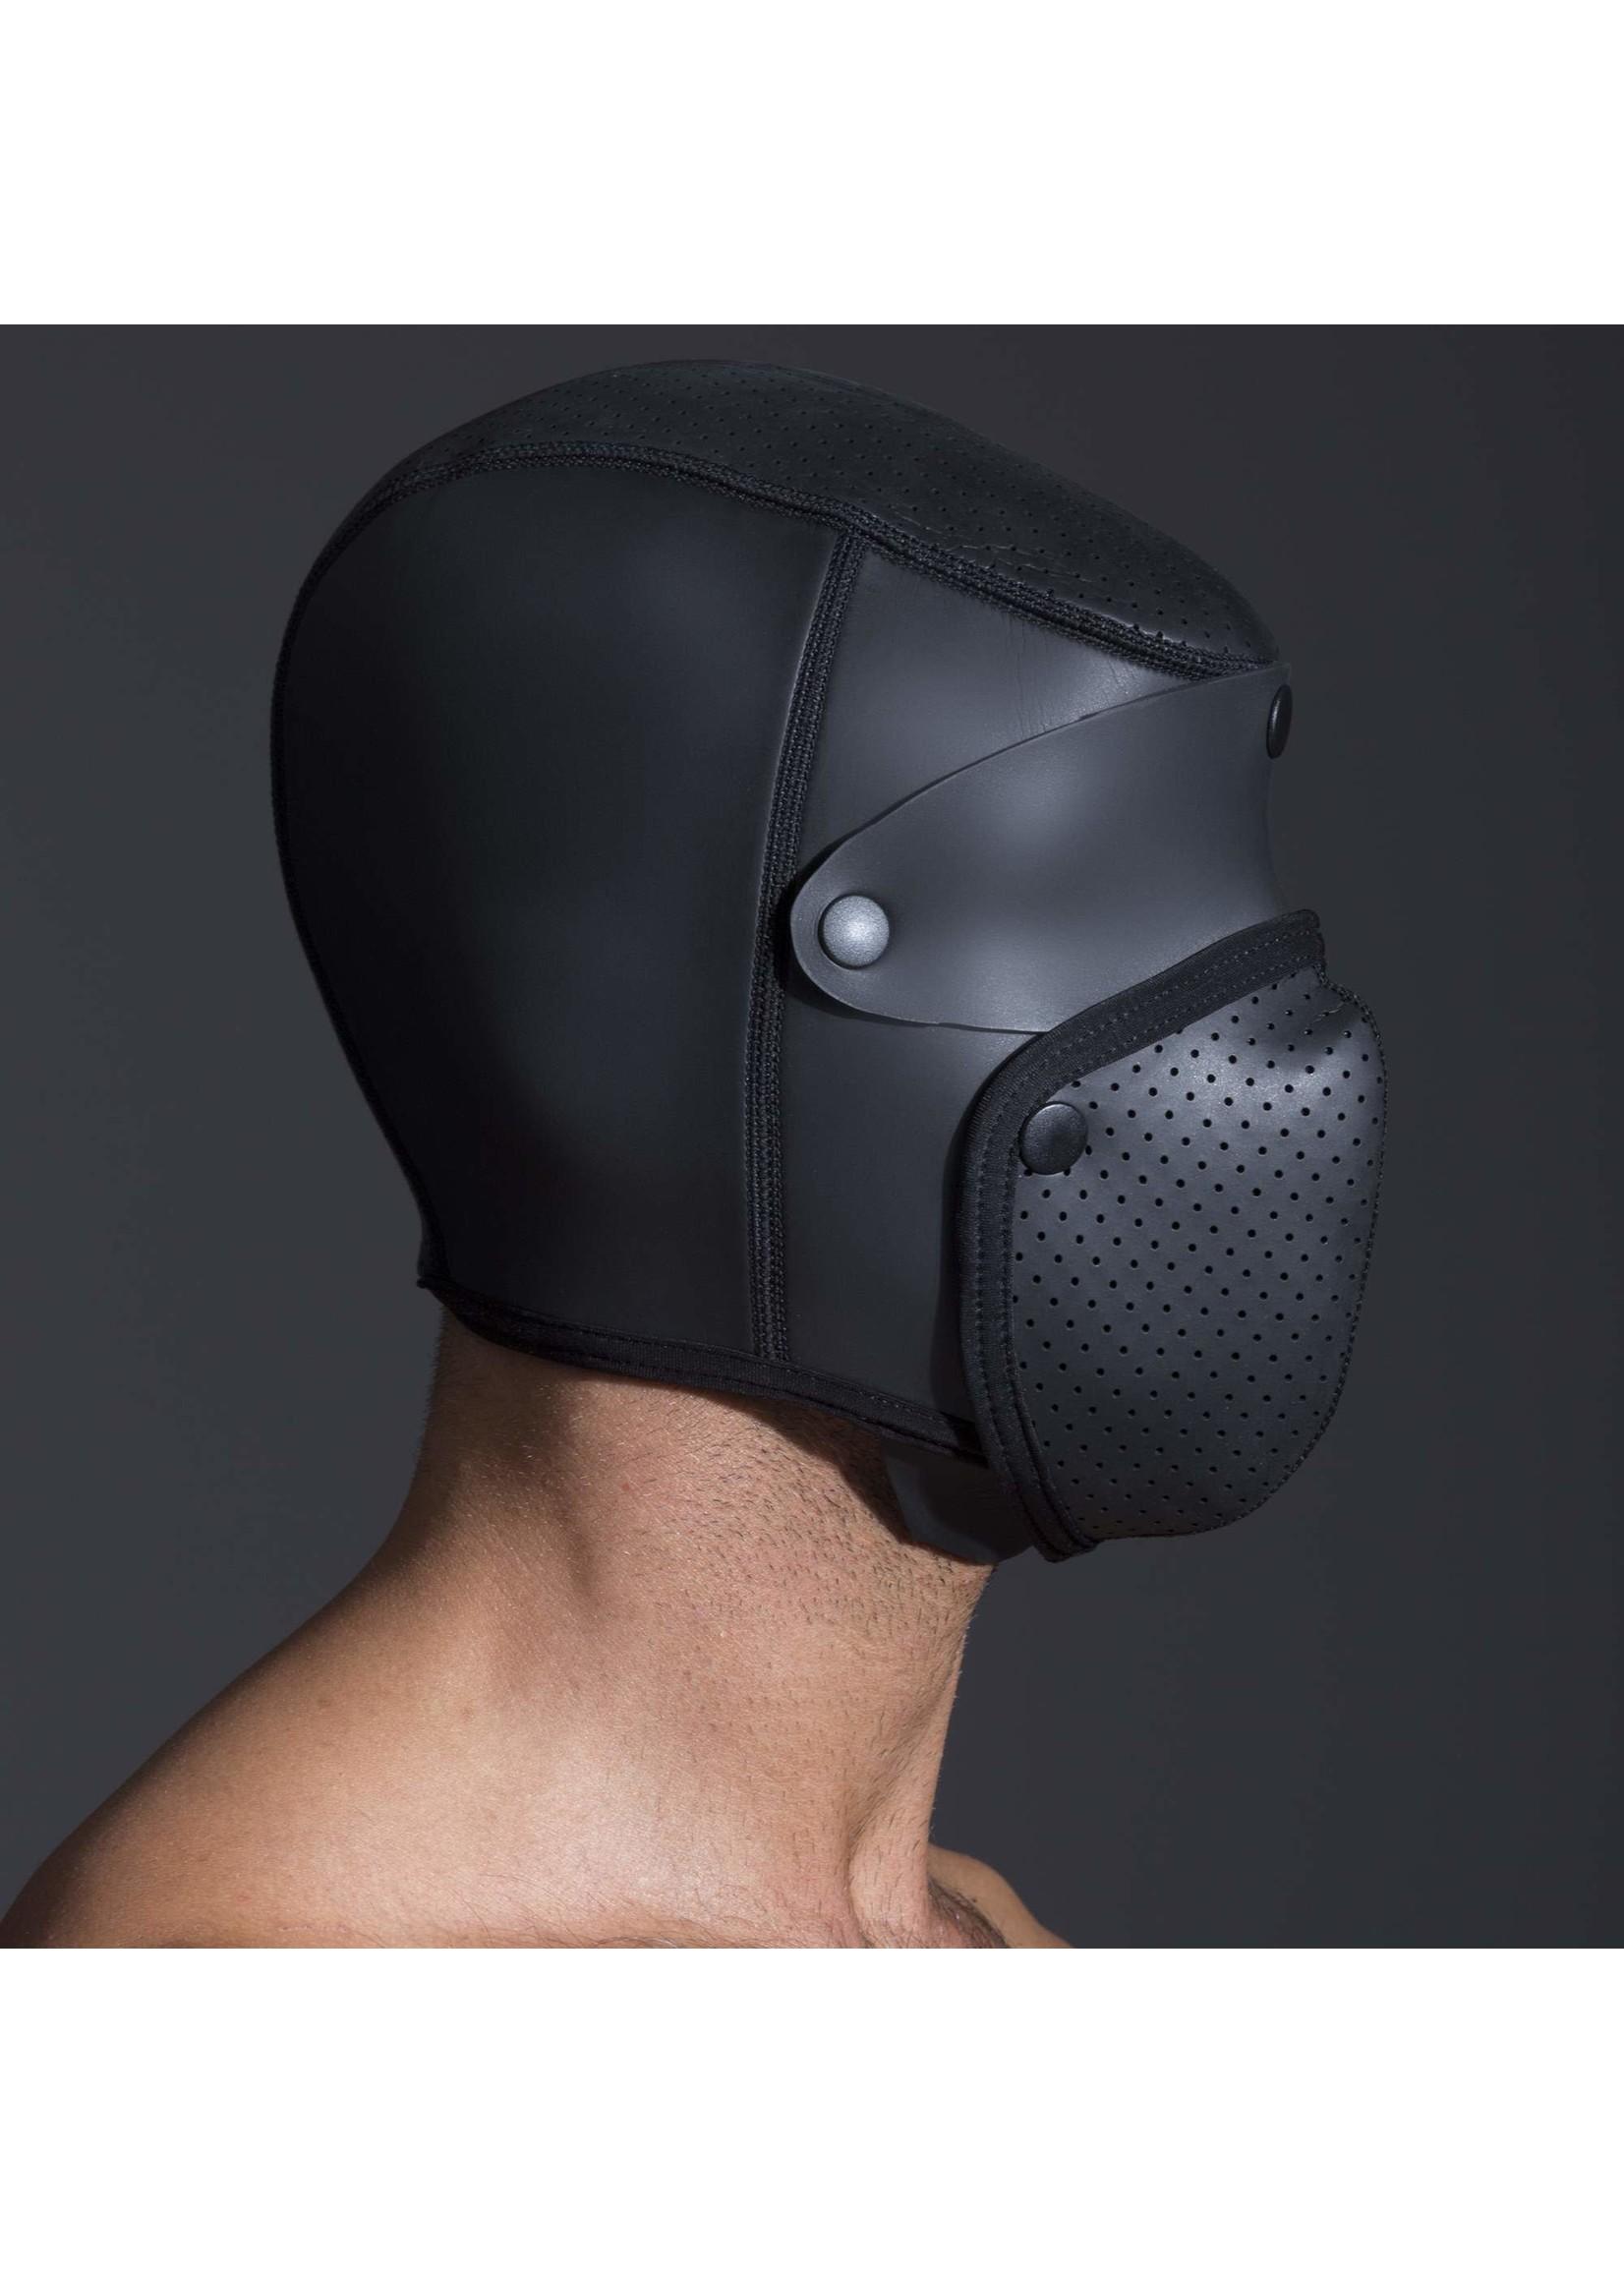 665 Leather 665 Neo Bondge Hood 2.0